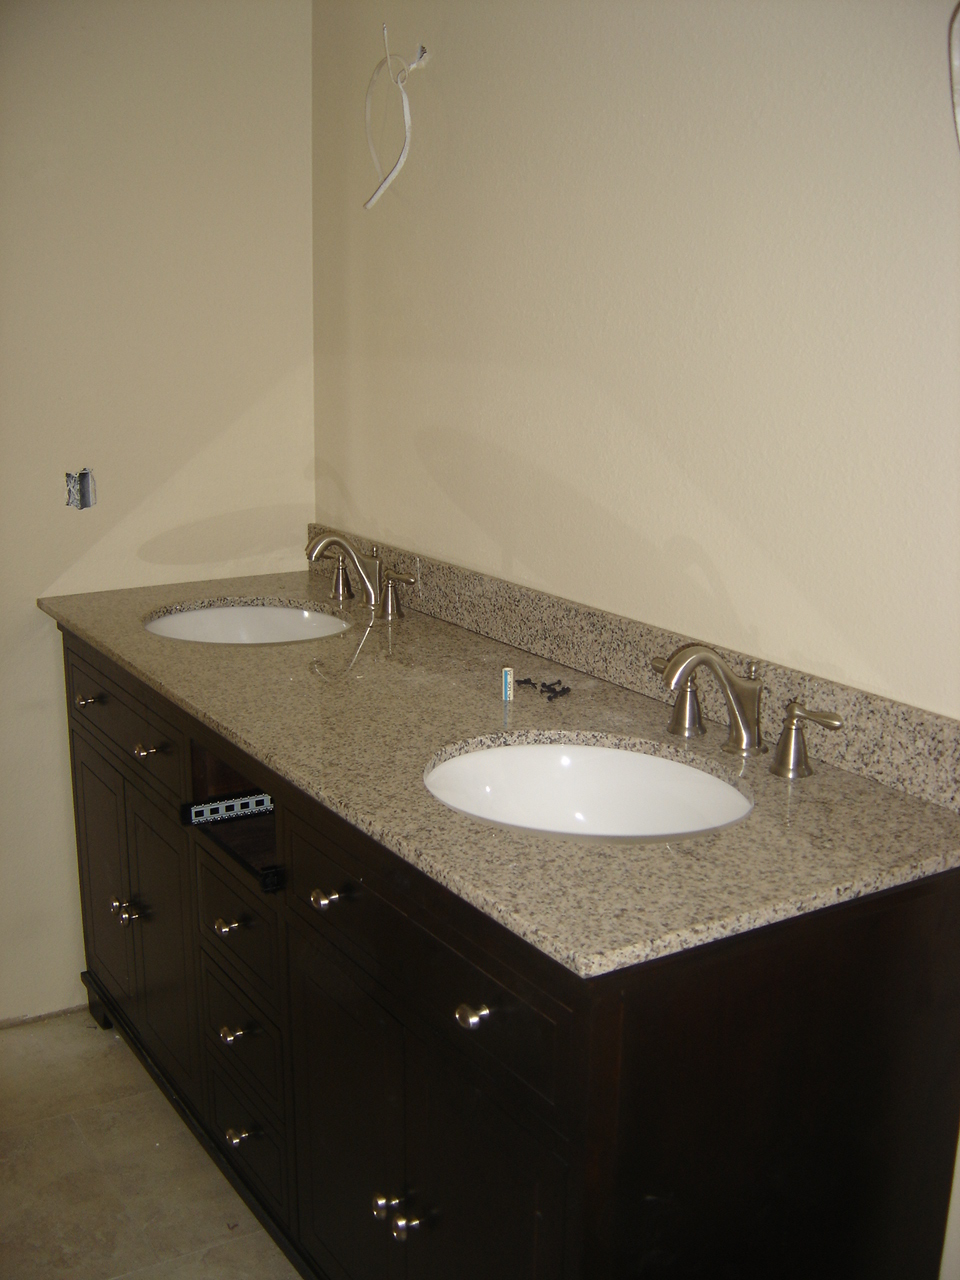 Tile metrics custom granite countertops 3cm 35sqft free - Custom bathroom countertops with sink ...